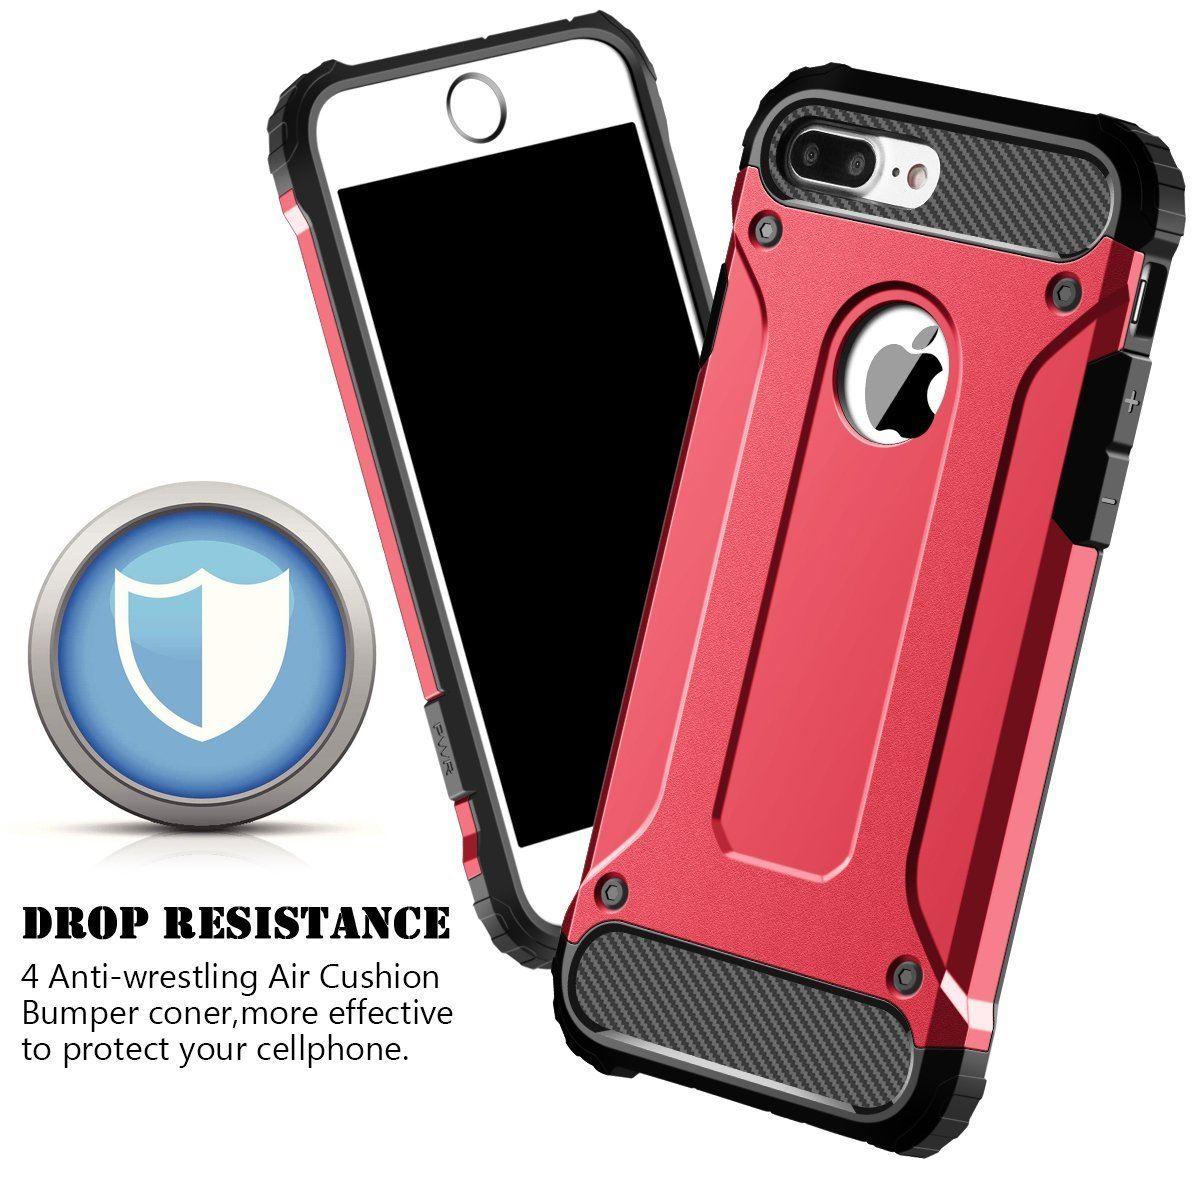 thumbnail 11 - For Apple iPhone 11 Pro Max XR Xs X 8 7 Plus 6 5 Se Case Cover Tough Armor